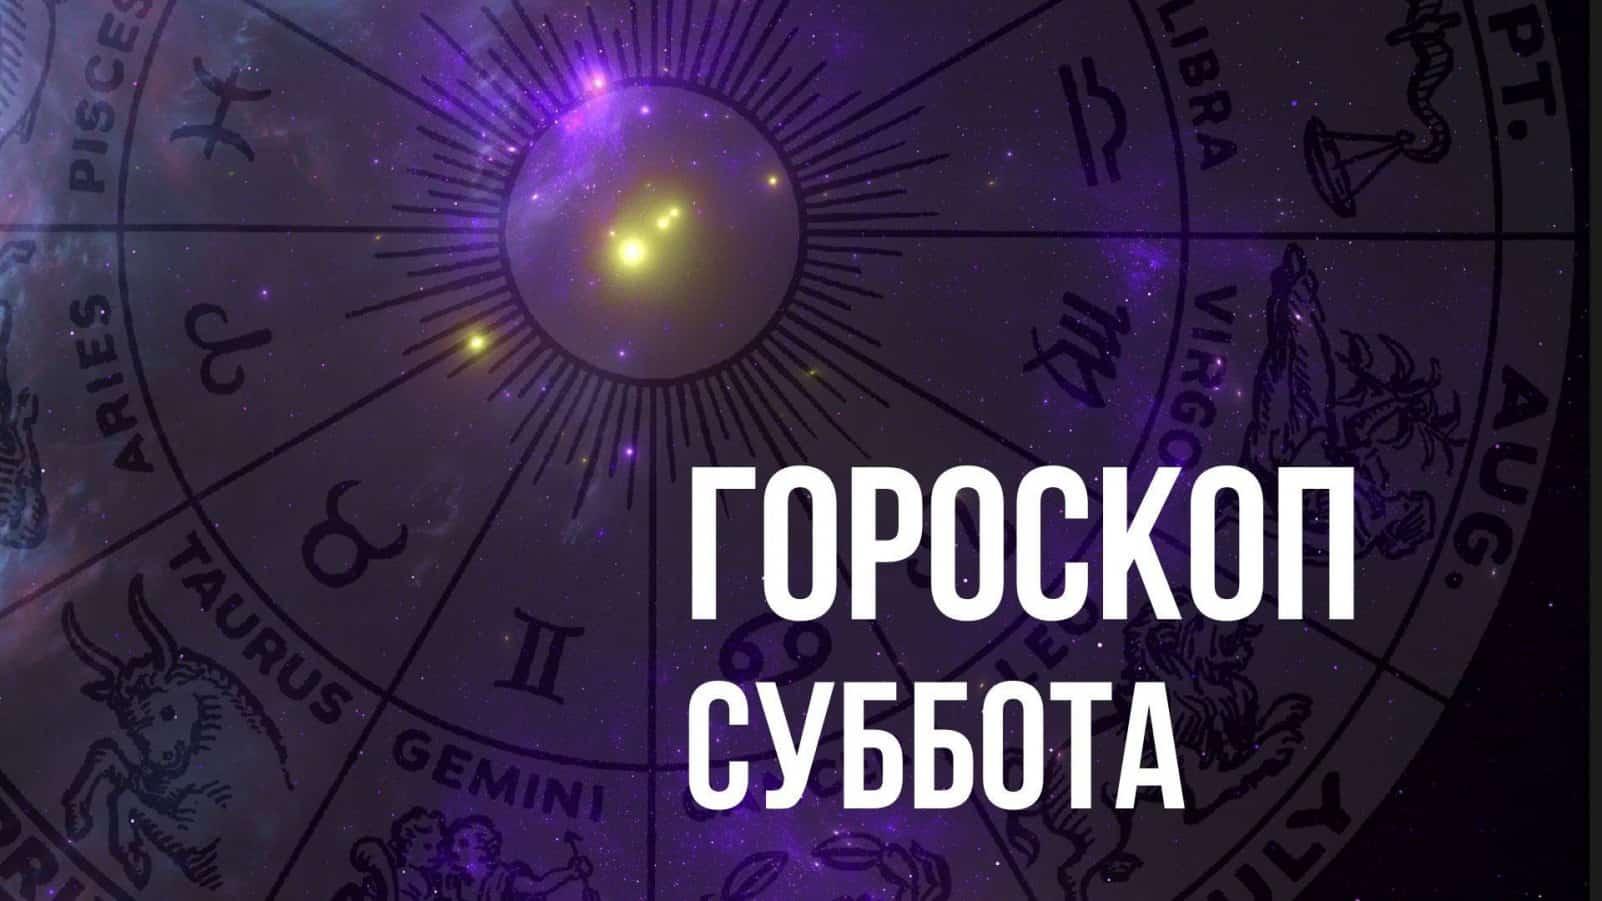 Гороскоп на субботу 19 июня для каждого знака Зодиака